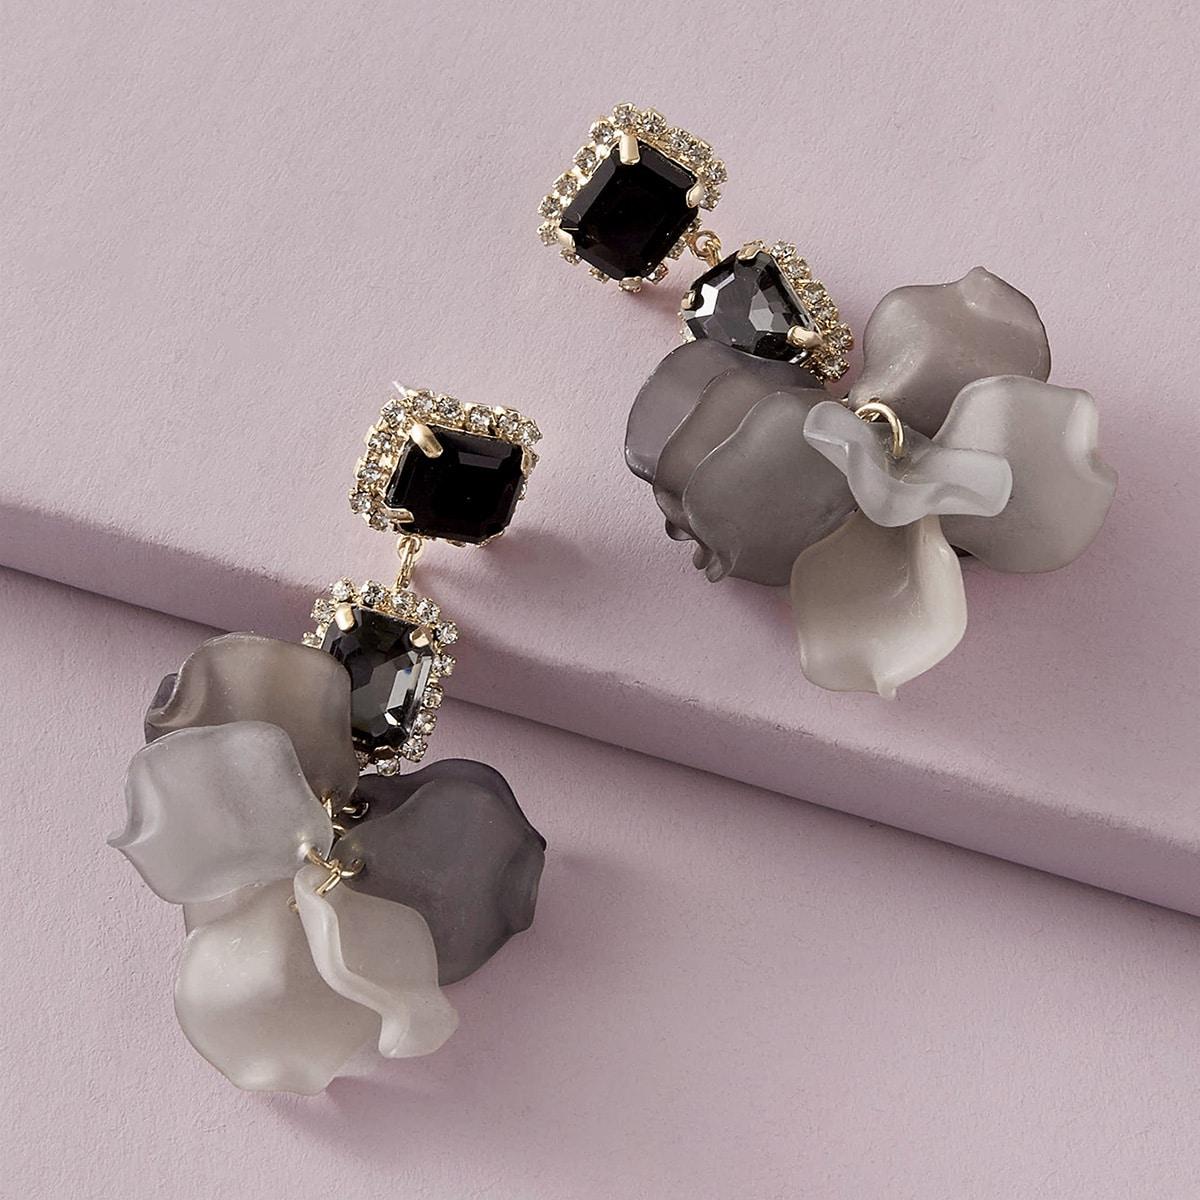 1pair Rhinestone Decor Flower Drop Earrings